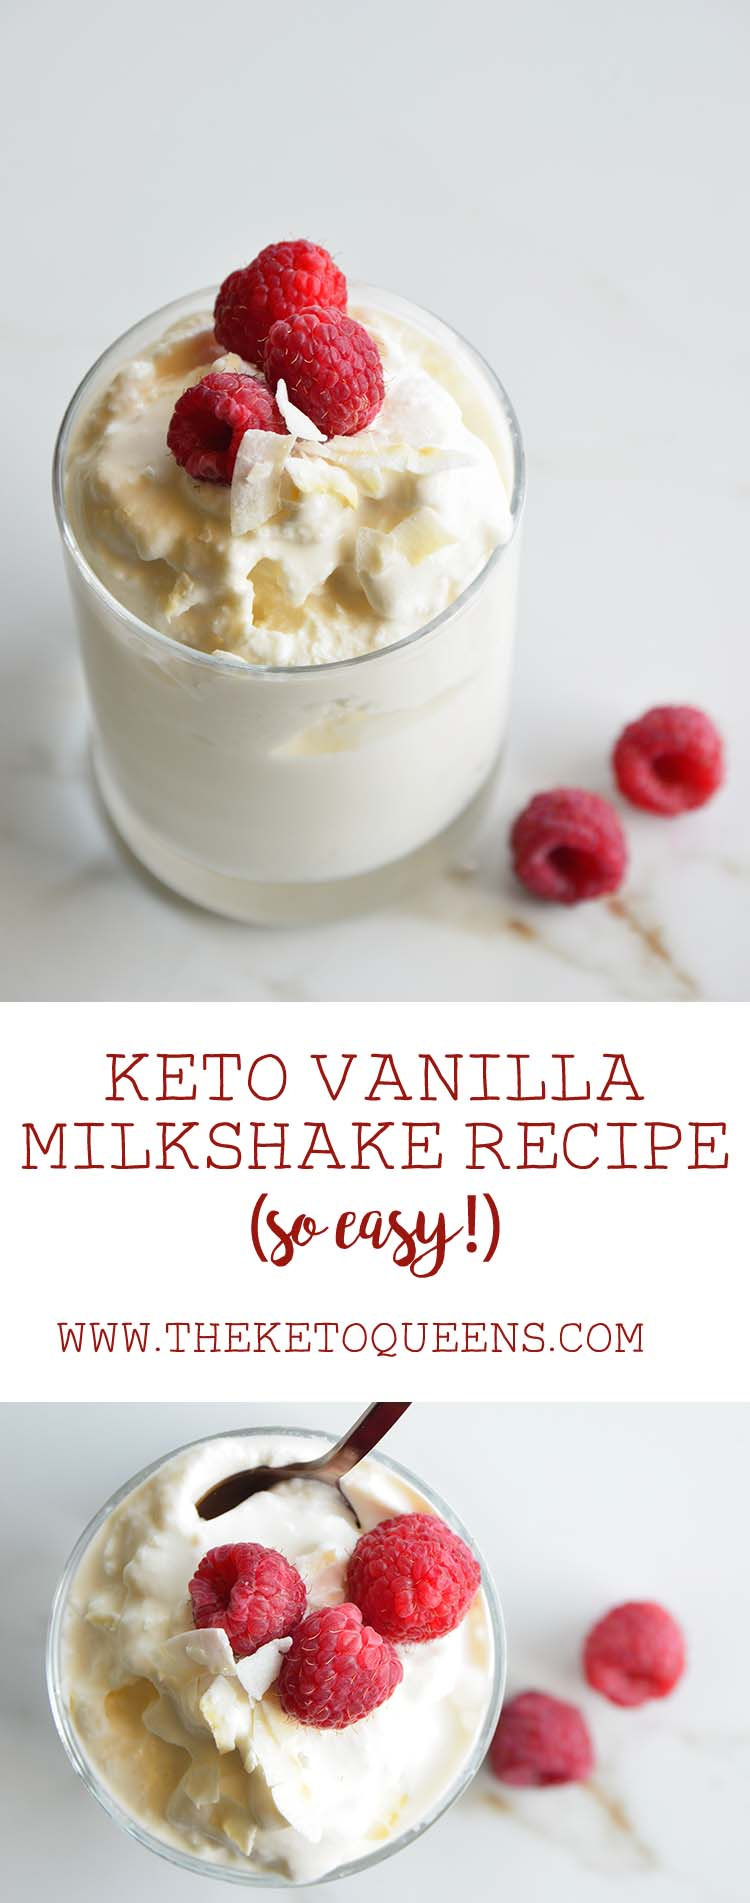 Keto Vanilla Milkshake Recipe Pin